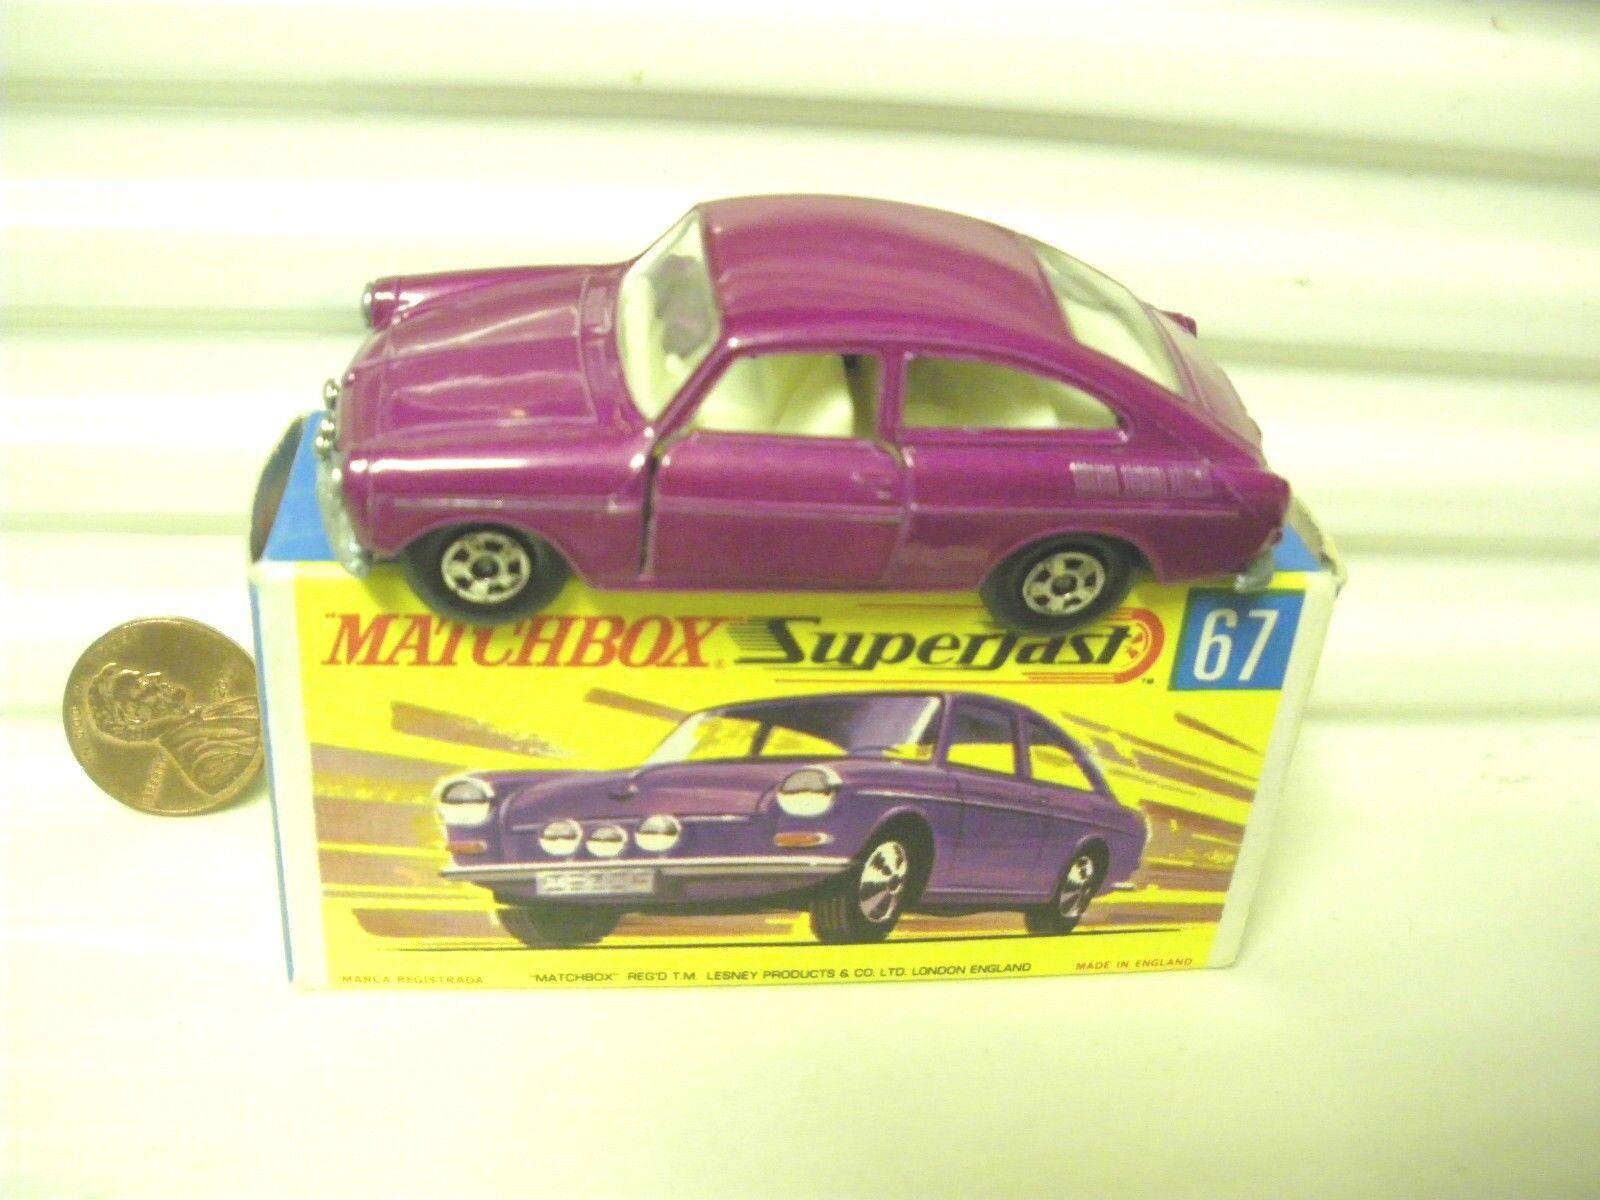 Lesney matchbox 1970 mb67a traube vw volkswagen 1600tl  c9 mint in frische minze bx